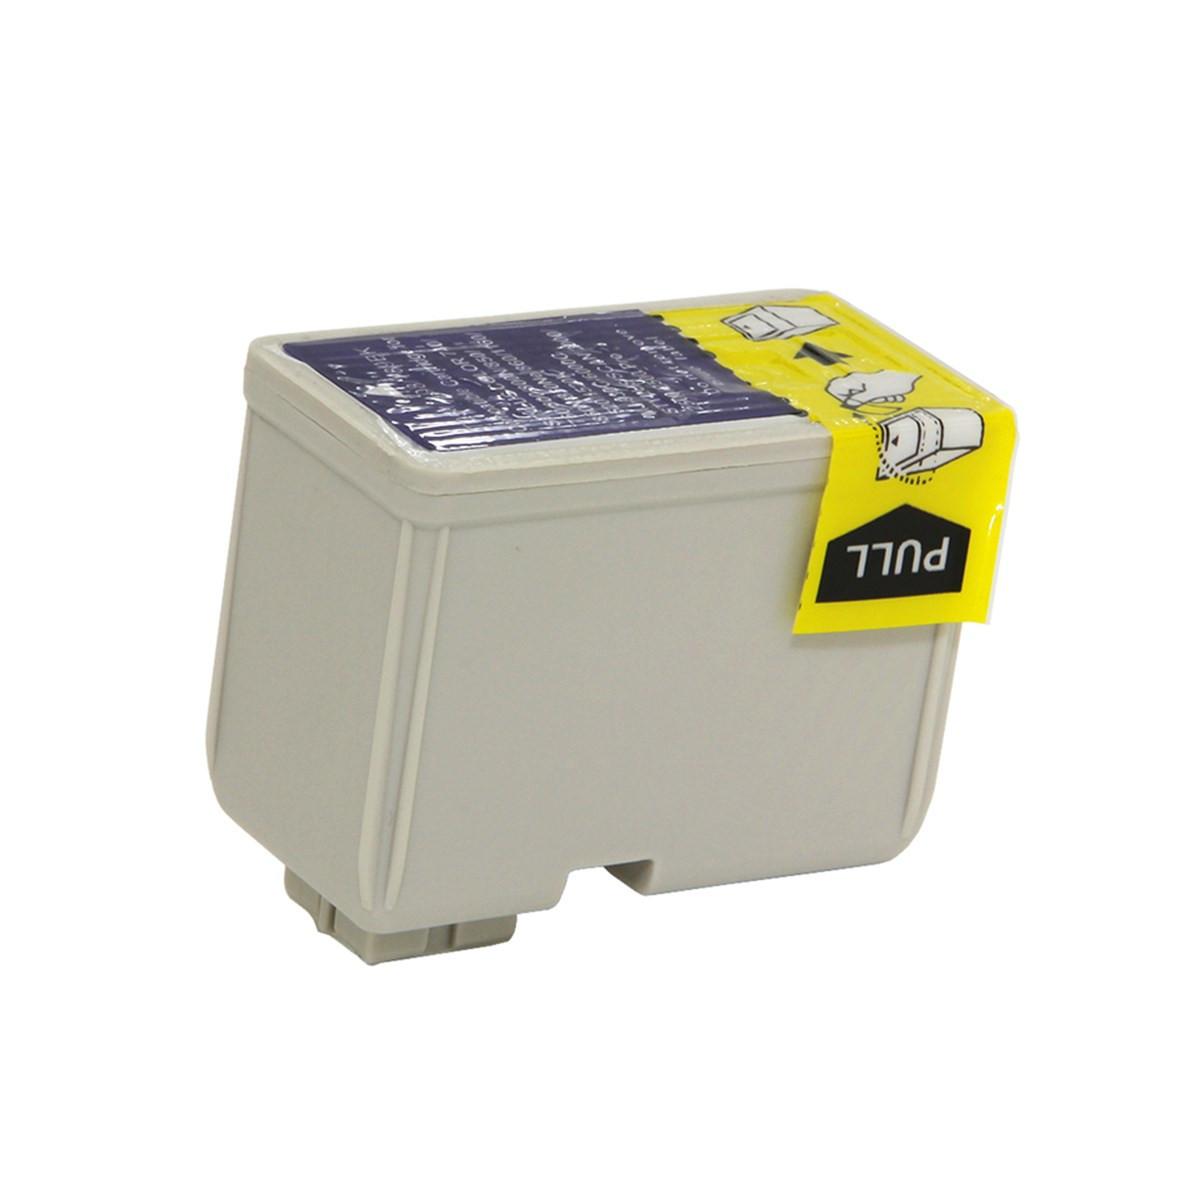 Cartucho de Tinta Epson Preto T051140 | S020108 | S020189 | 760 | 800 | 2500 | Compatível 22 ml